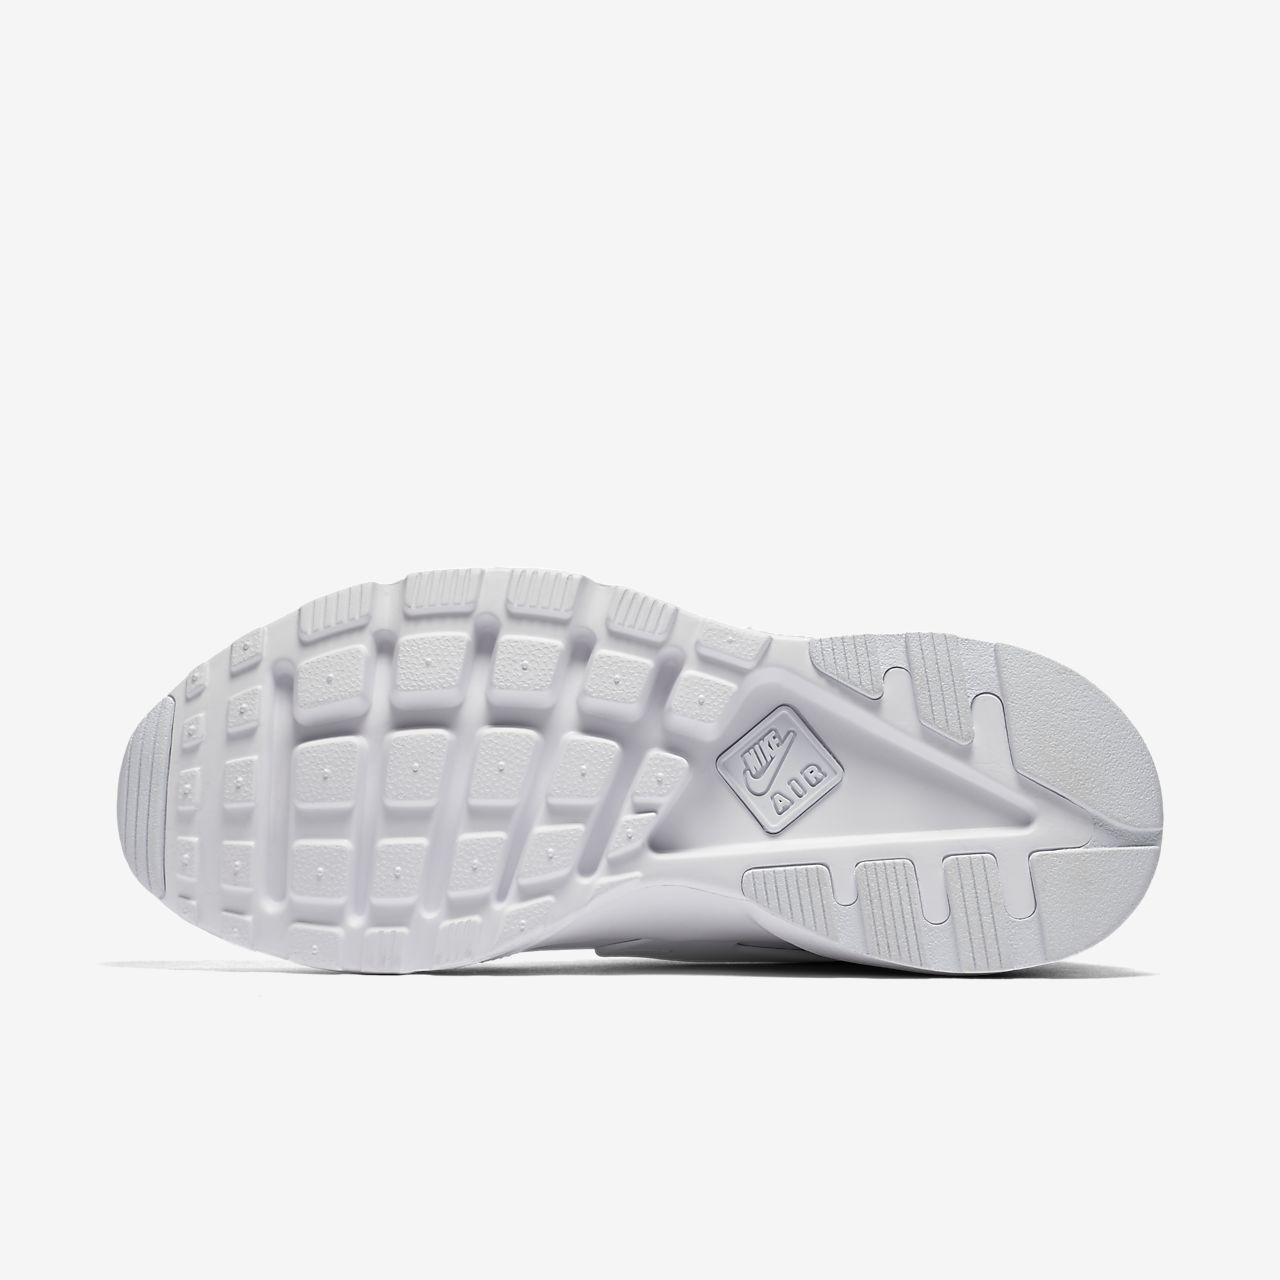 Huarache Nike Air Pour Be Ultra Chaussure Homme zxwaHvzq